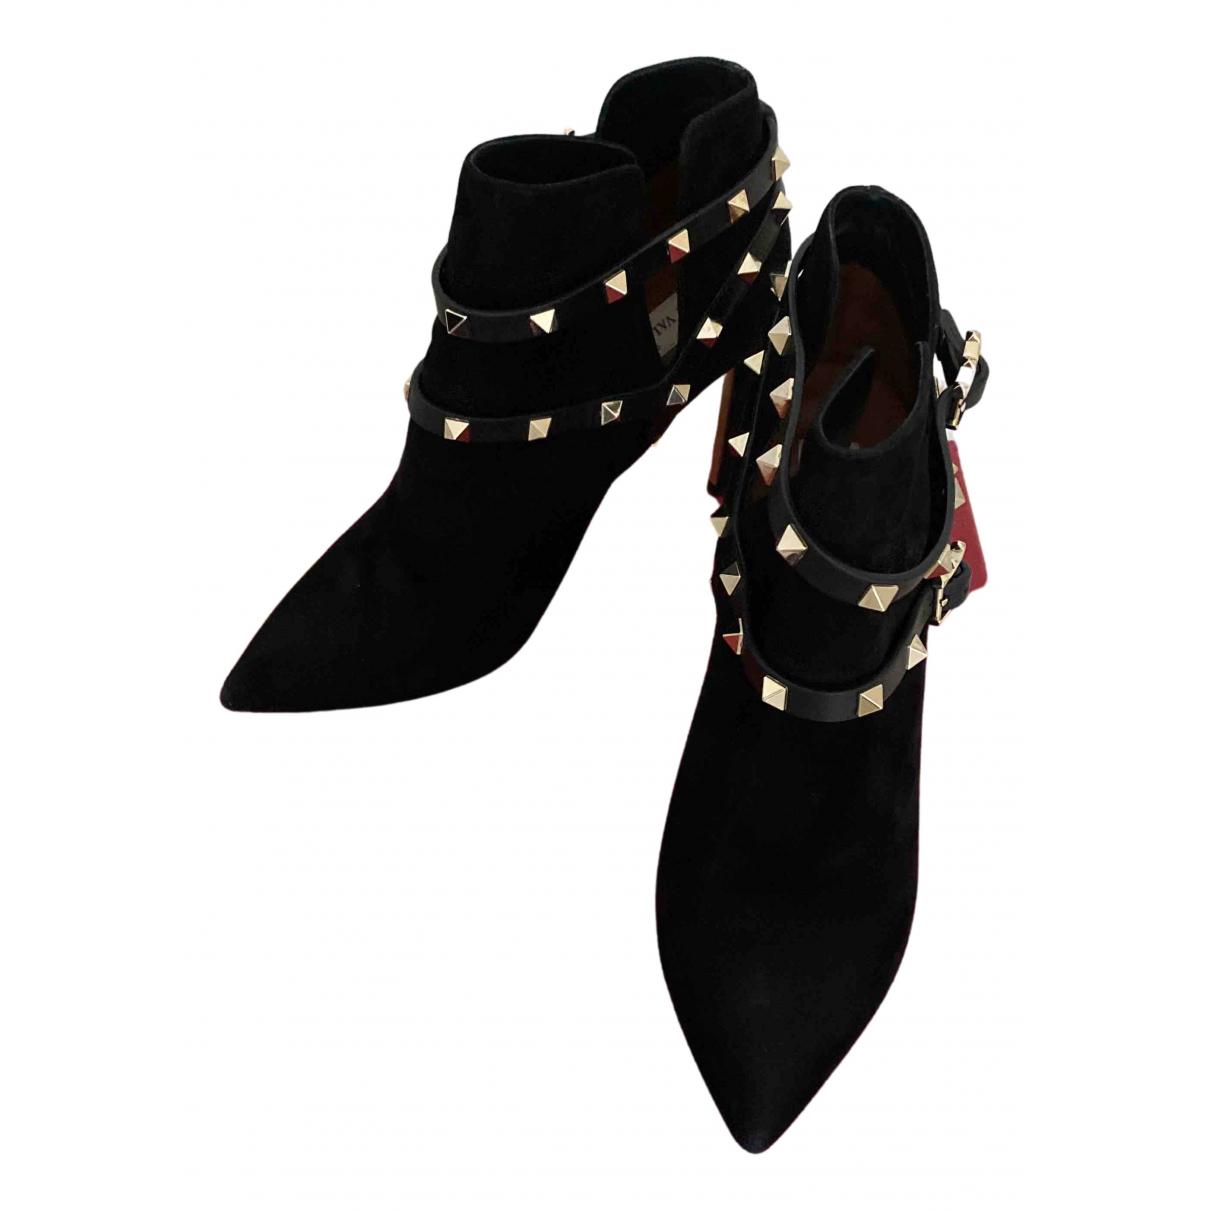 Valentino Garavani Rockstud Black Suede Ankle boots for Women 5.5 UK